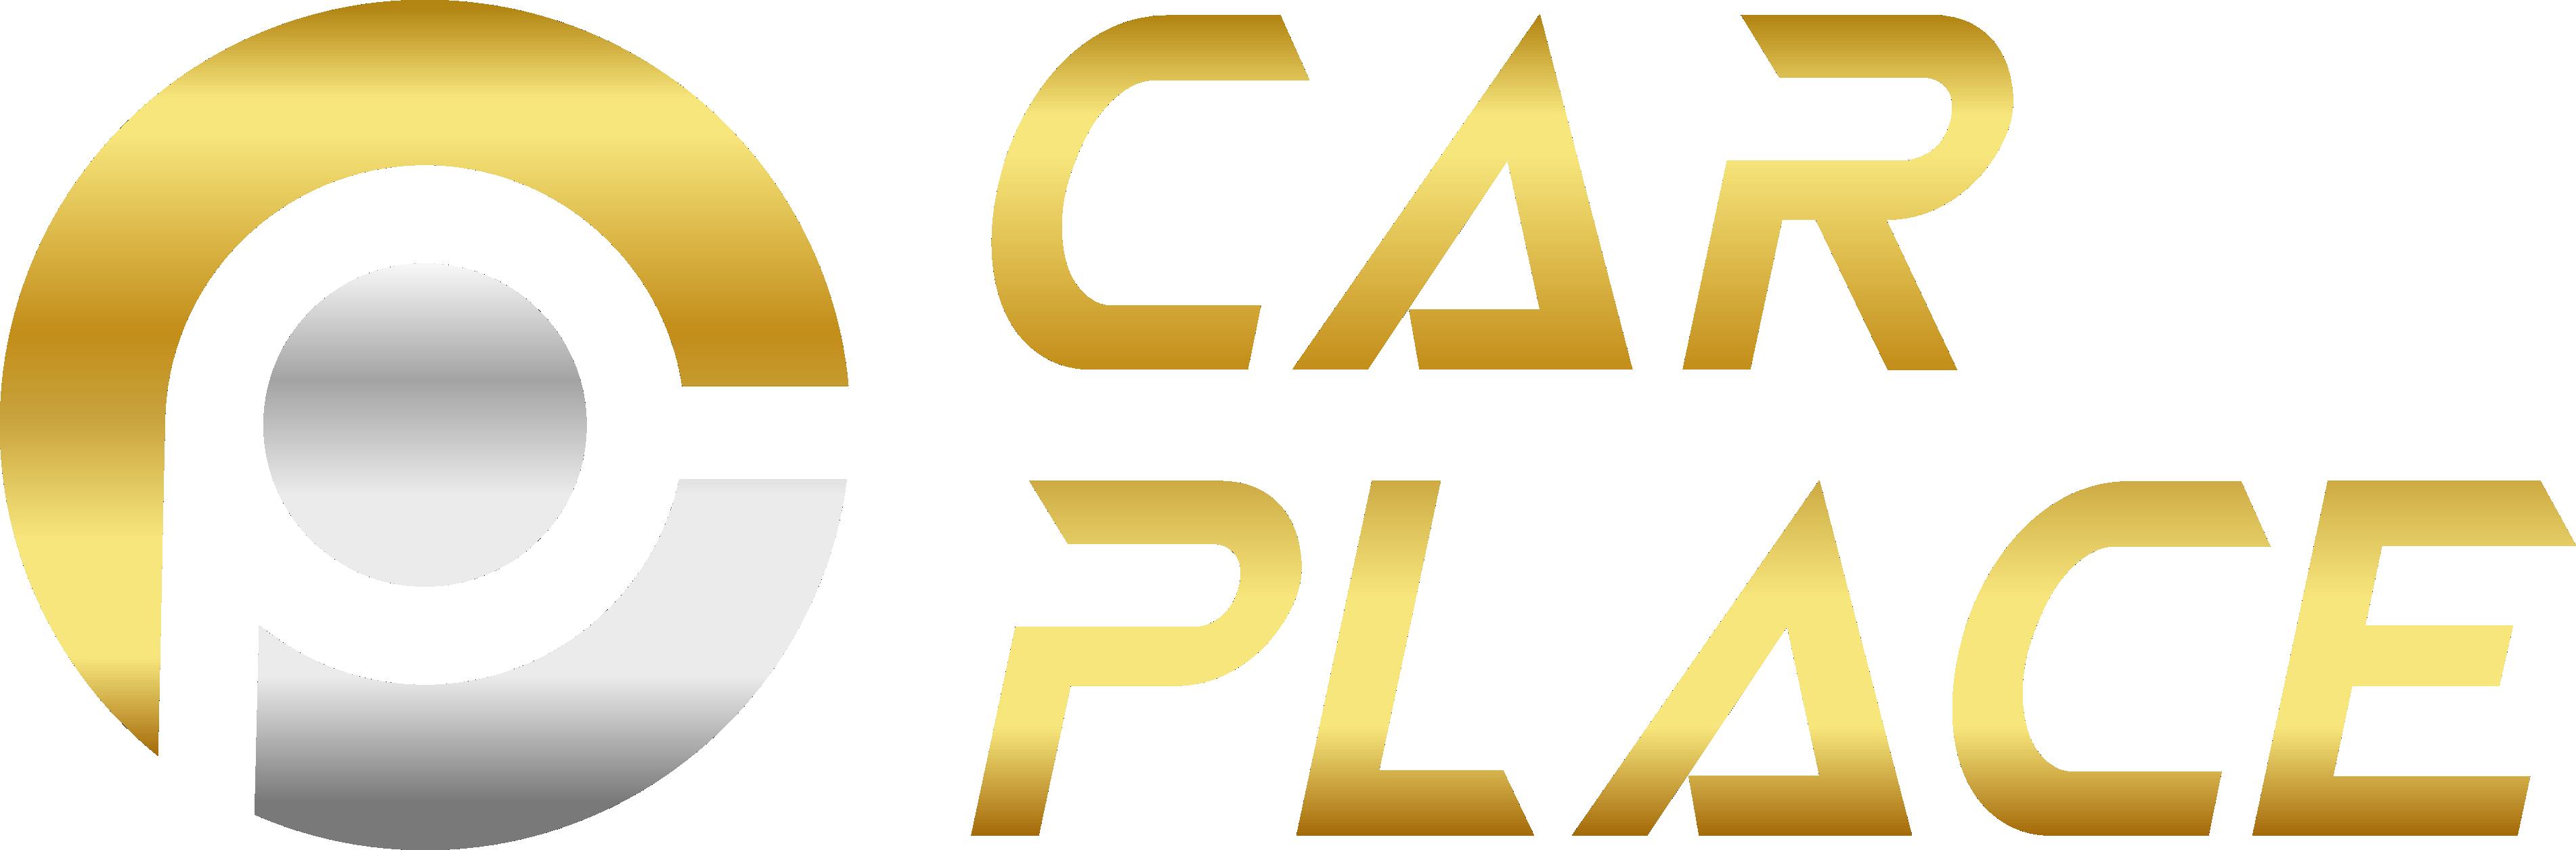 Autobedrijf Carplace Almere – Erkend & Ervaren!